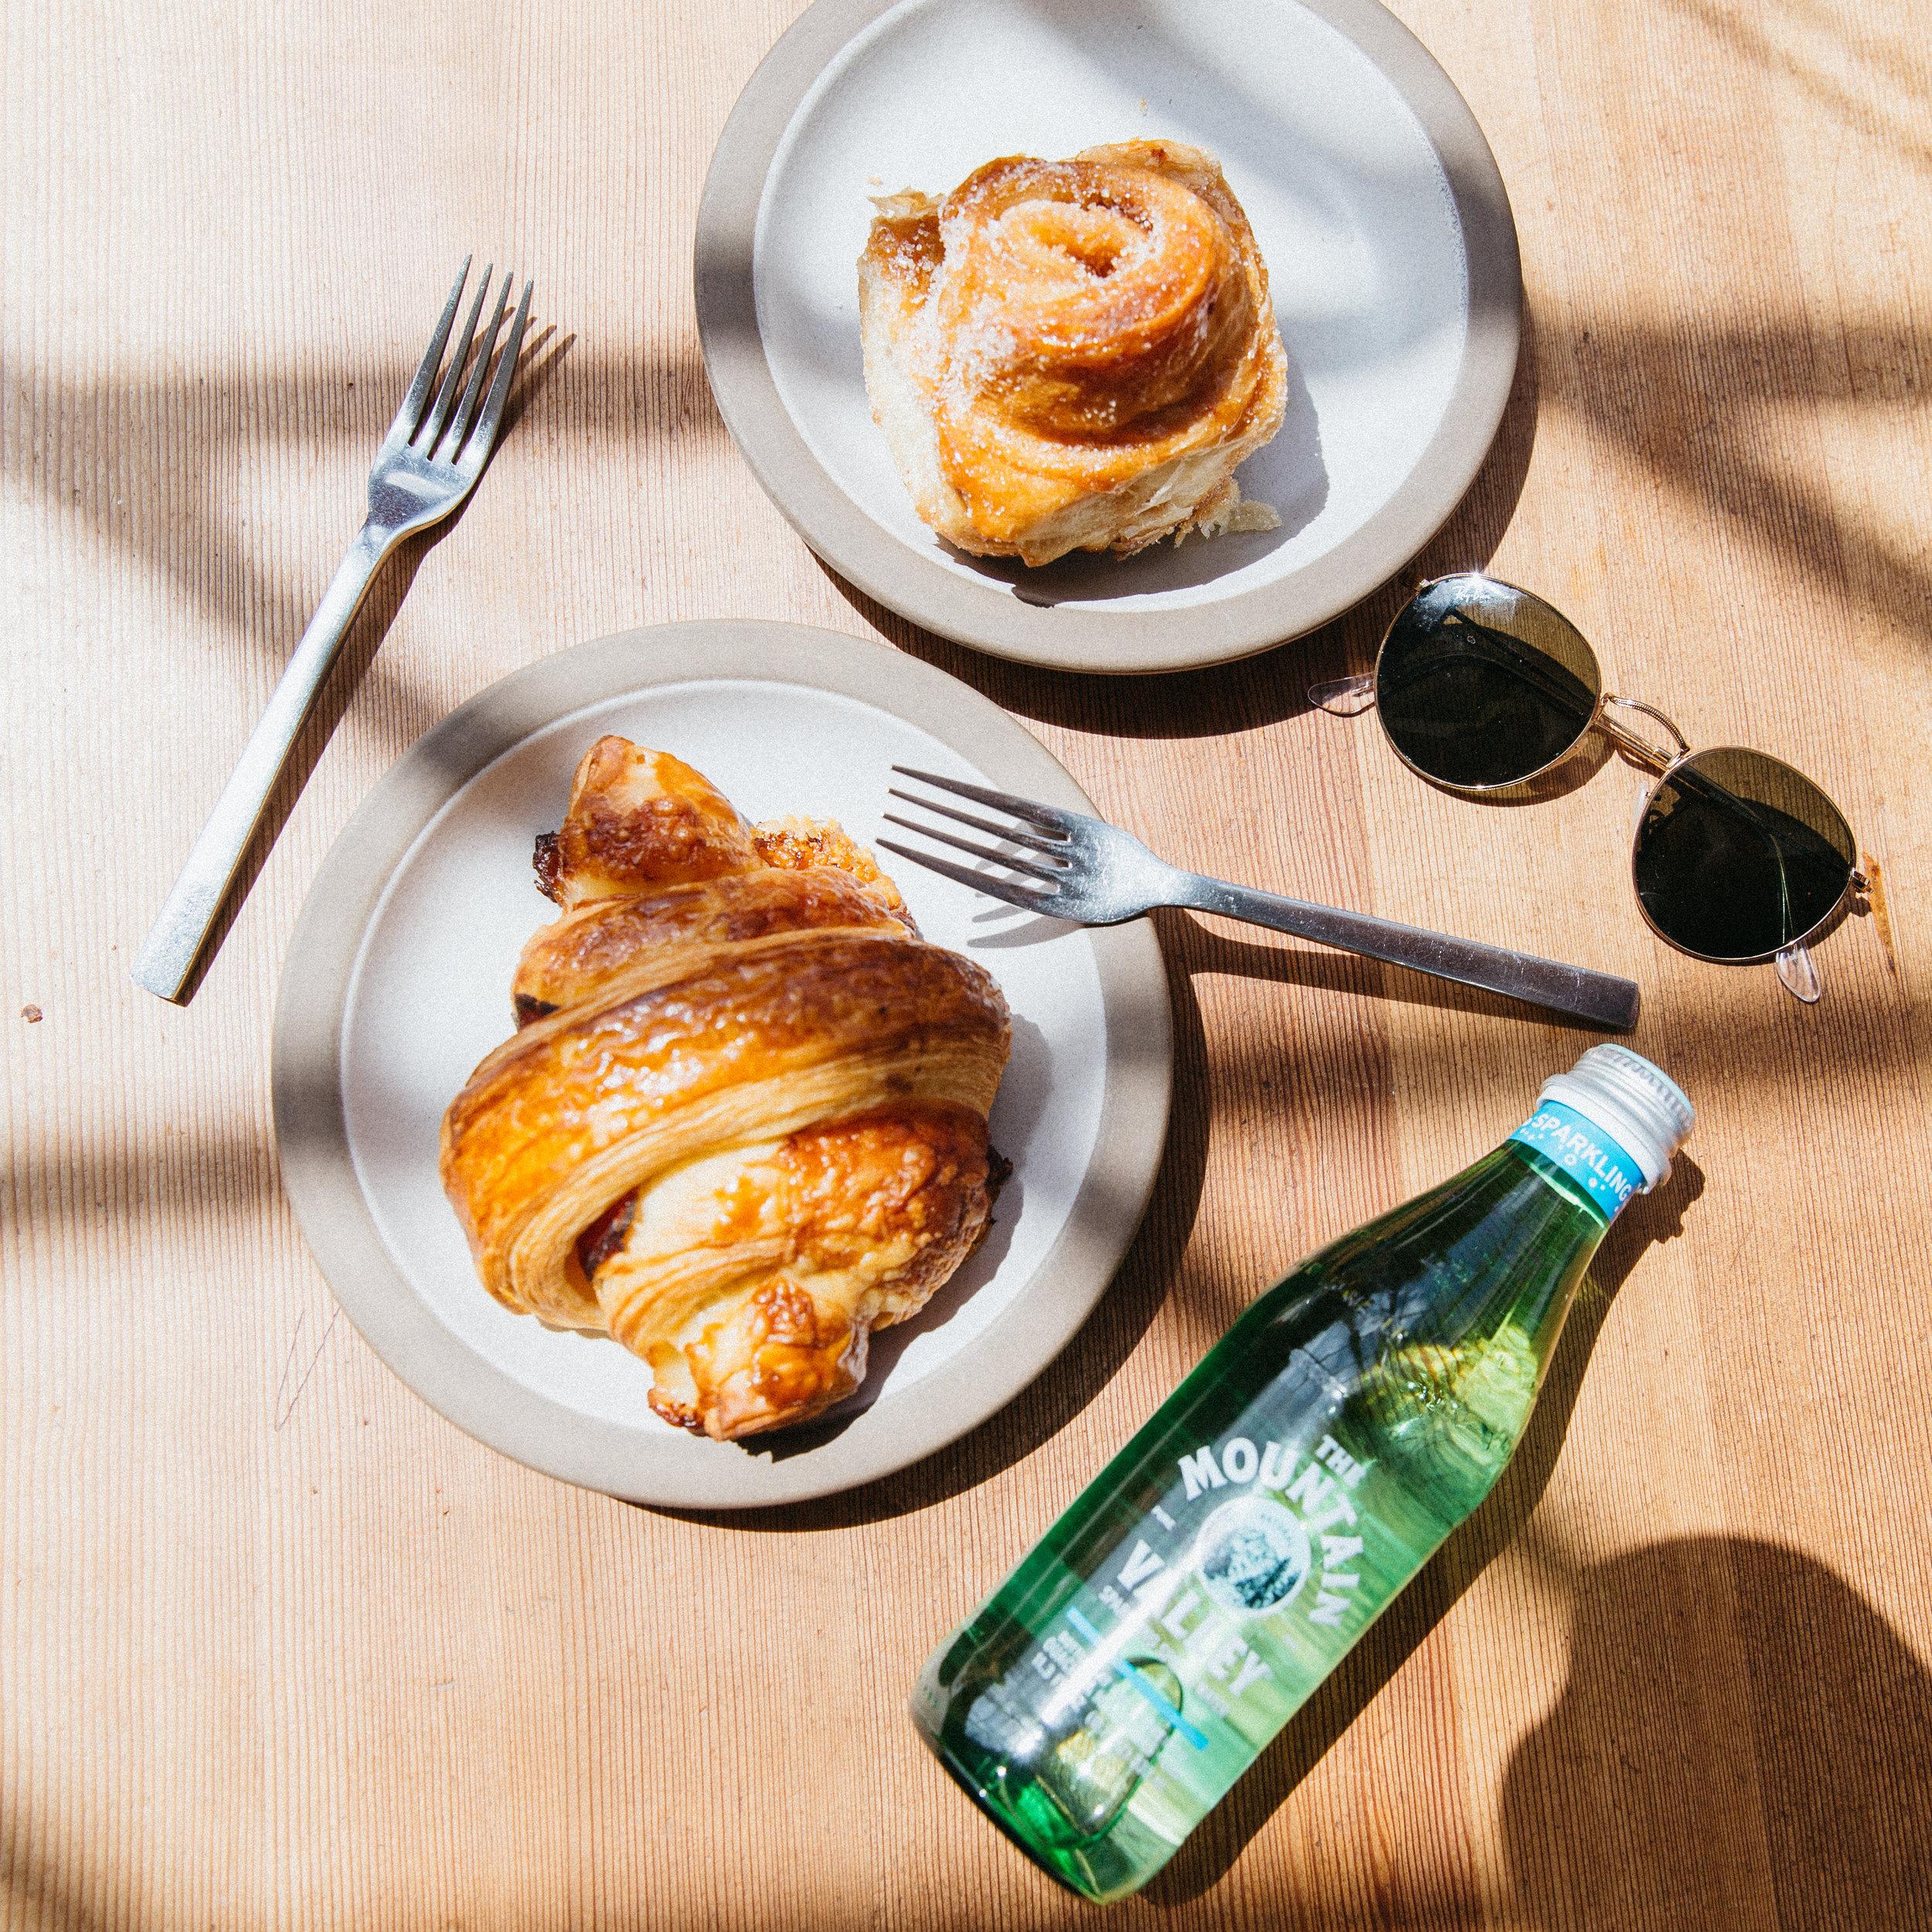 Stop #2: Tartine Bakery -